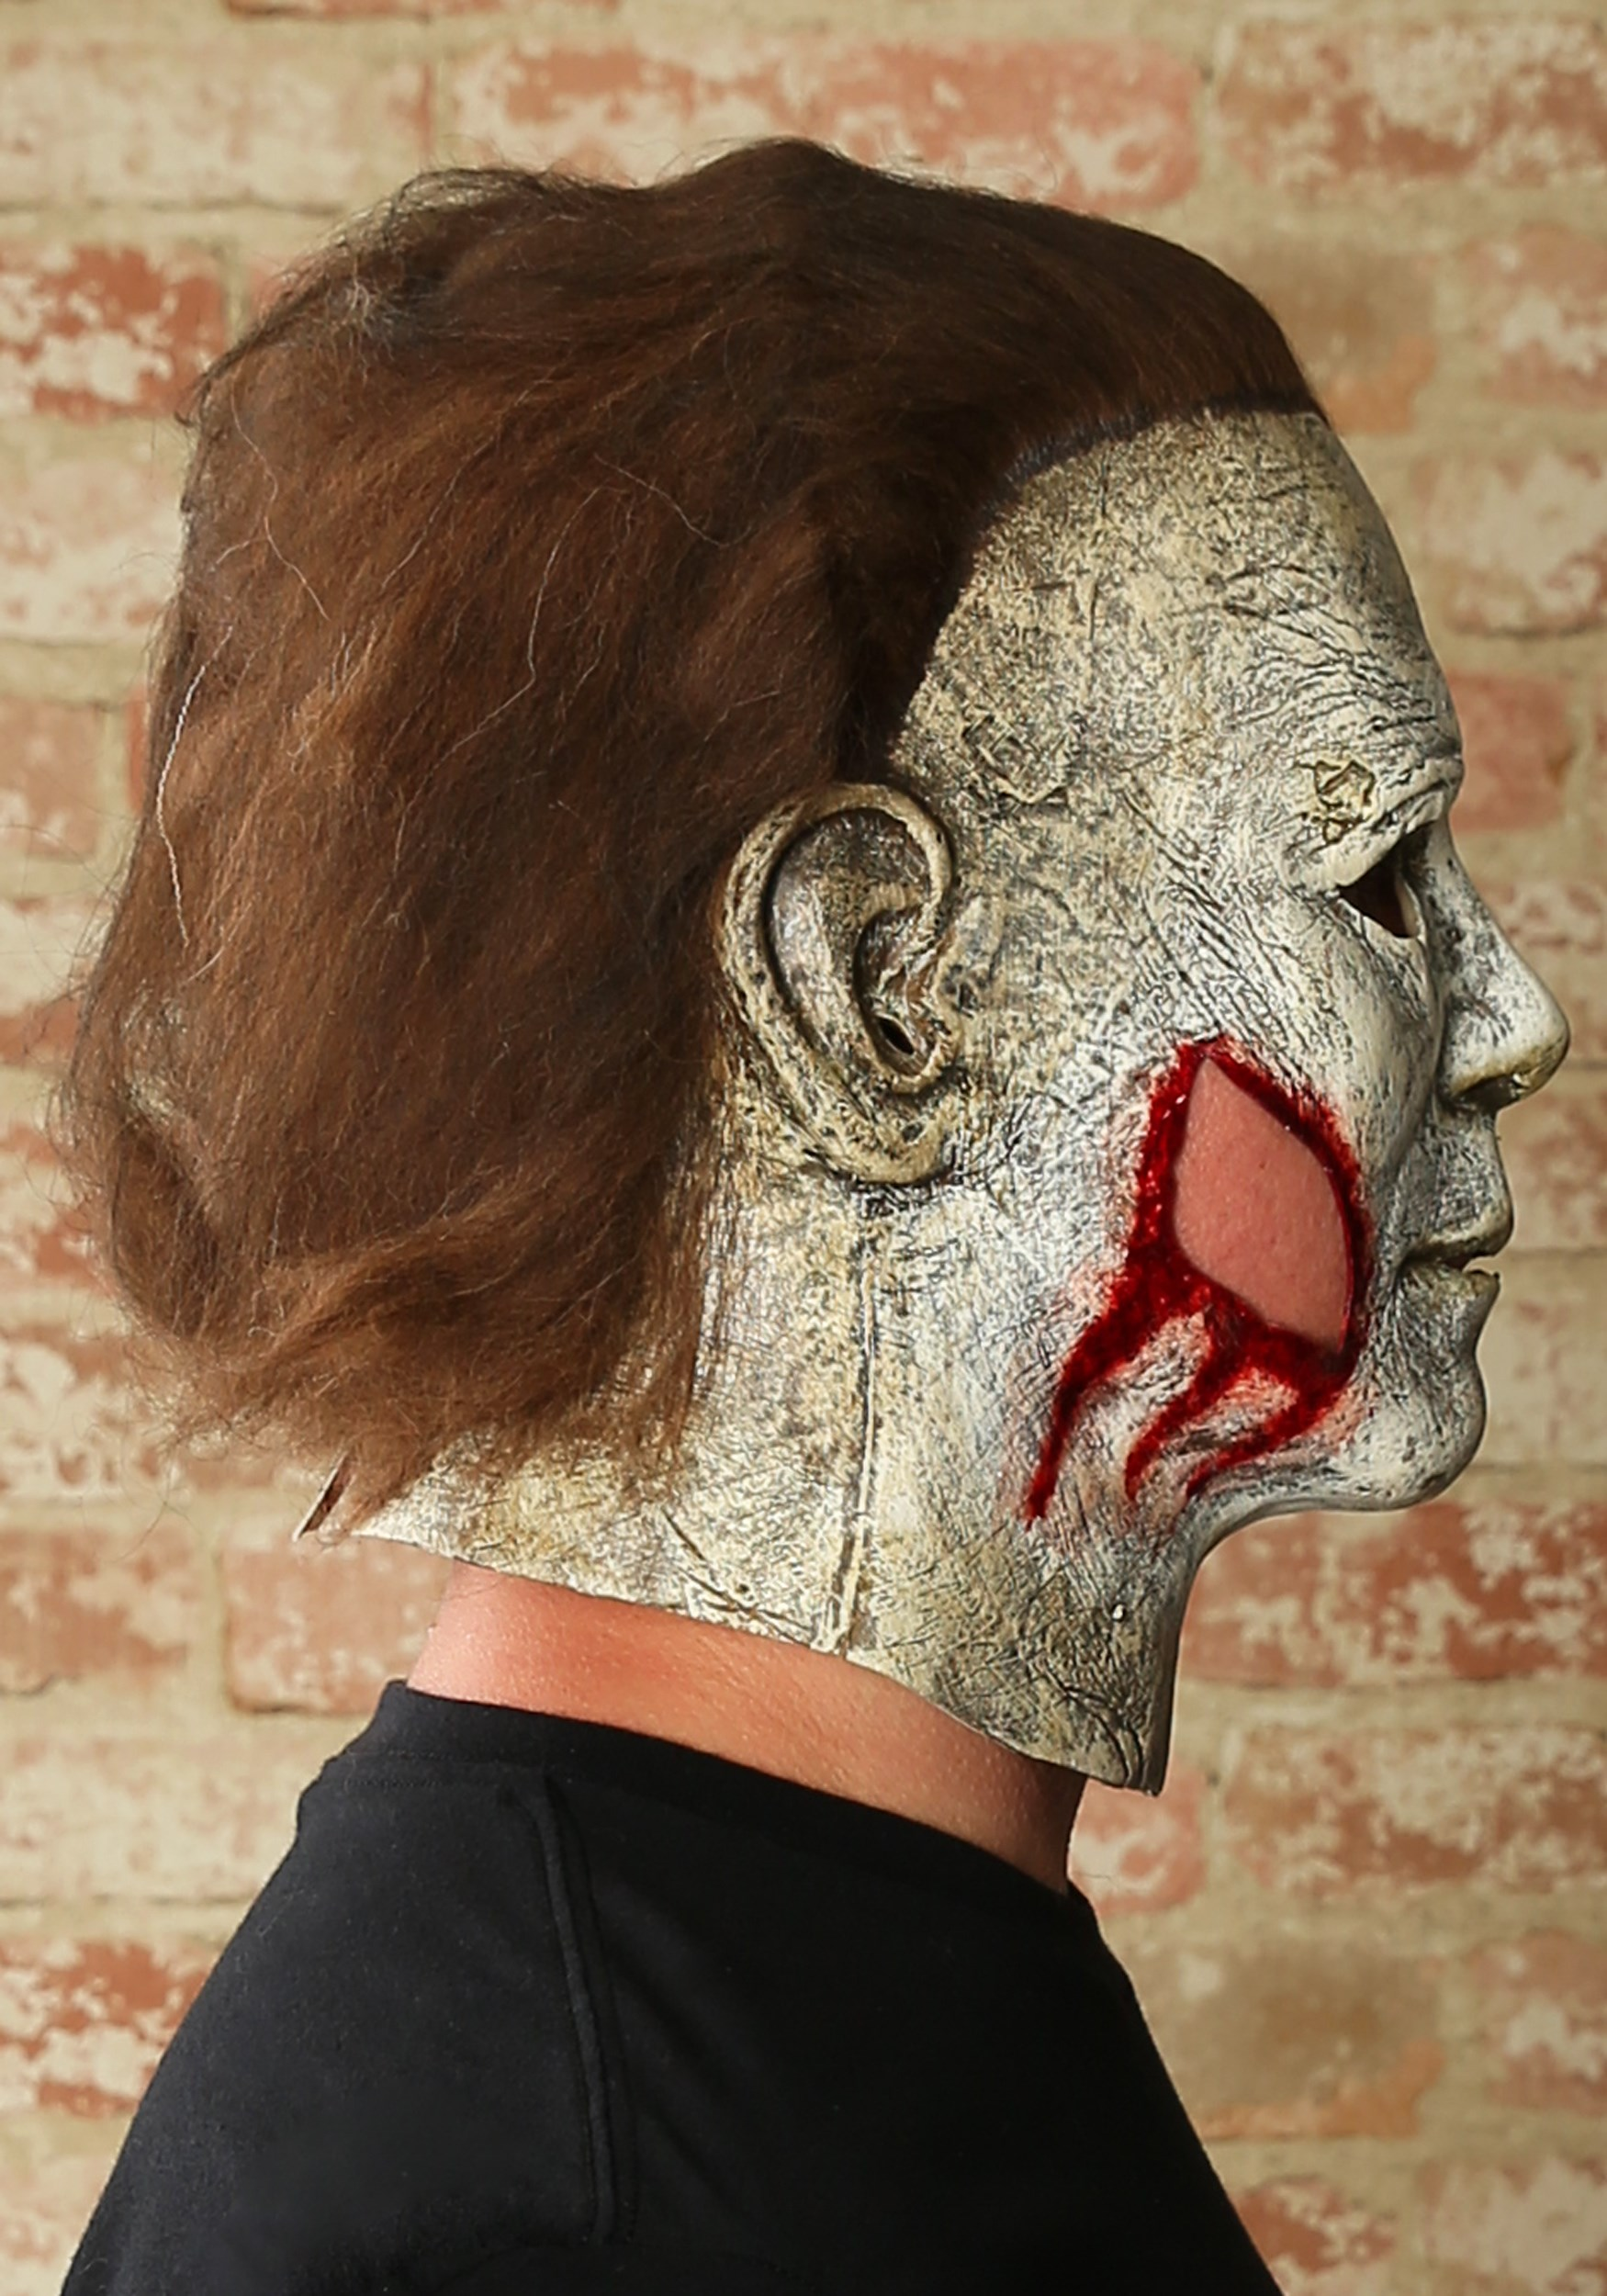 Michael Myers Final Battle Mask Halloween (2018)